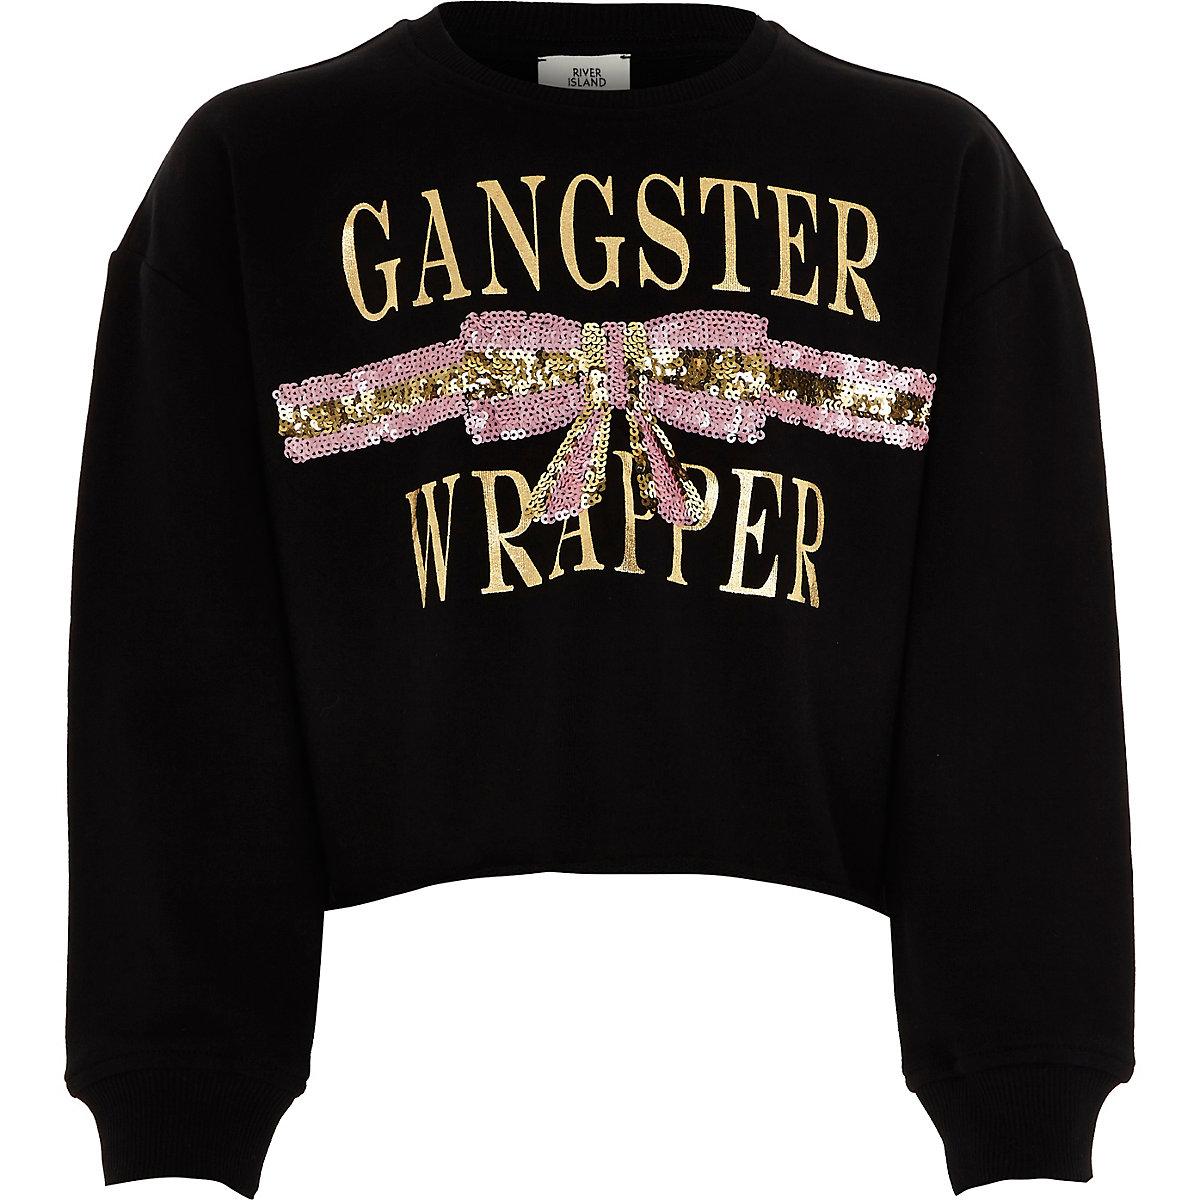 Girls black 'Gangster wrapper' sweatshirt